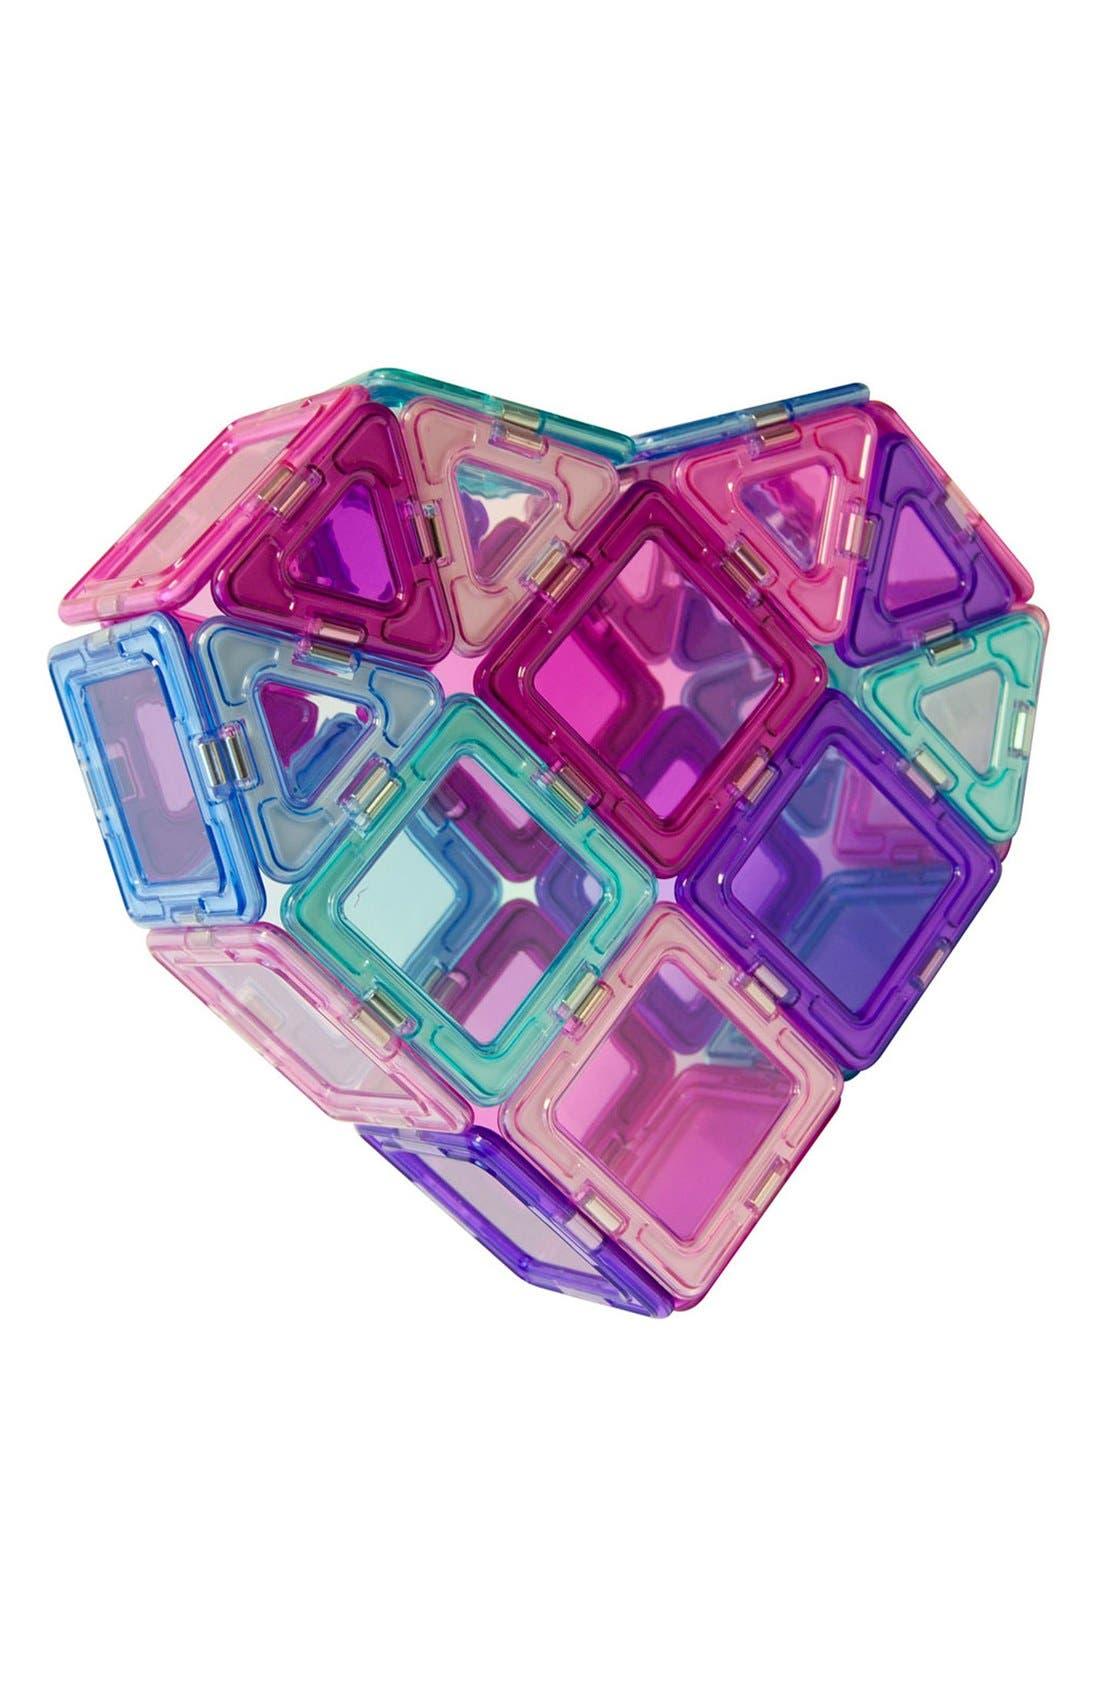 'Inspire - Solids' Clear Magnetic 3D Construction Set,                             Alternate thumbnail 4, color,                             440